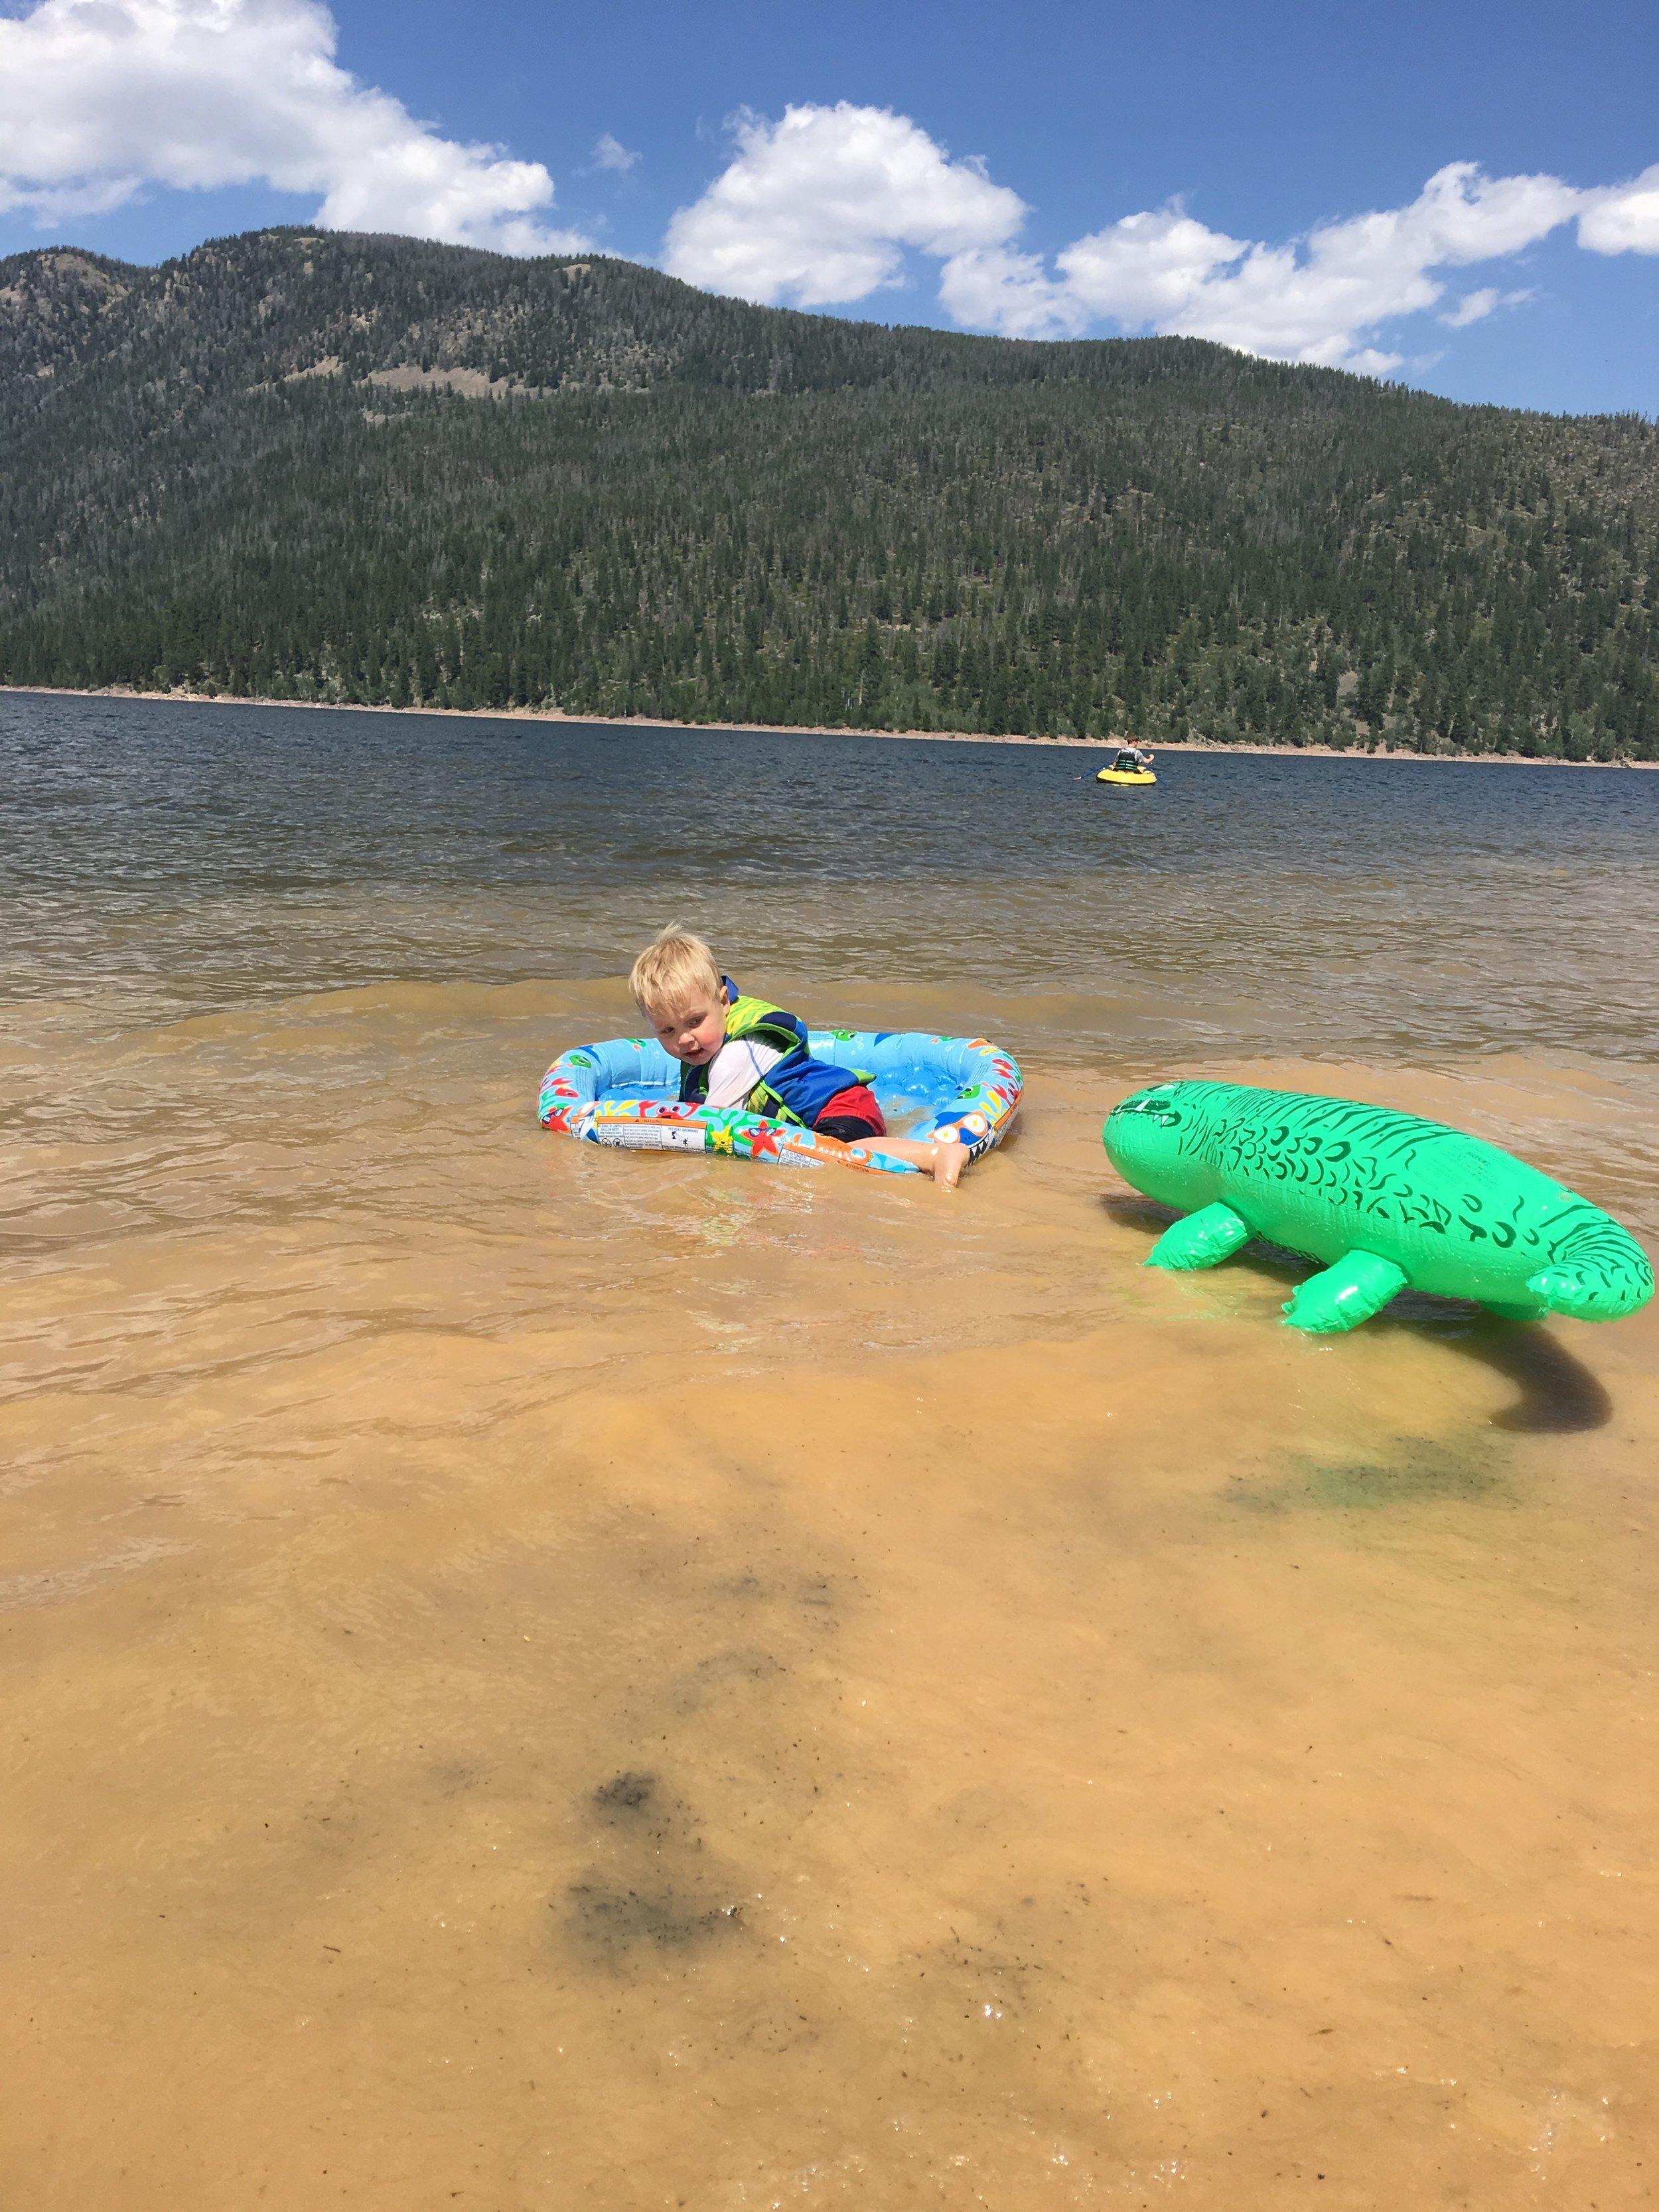 Attack of the fake alligator